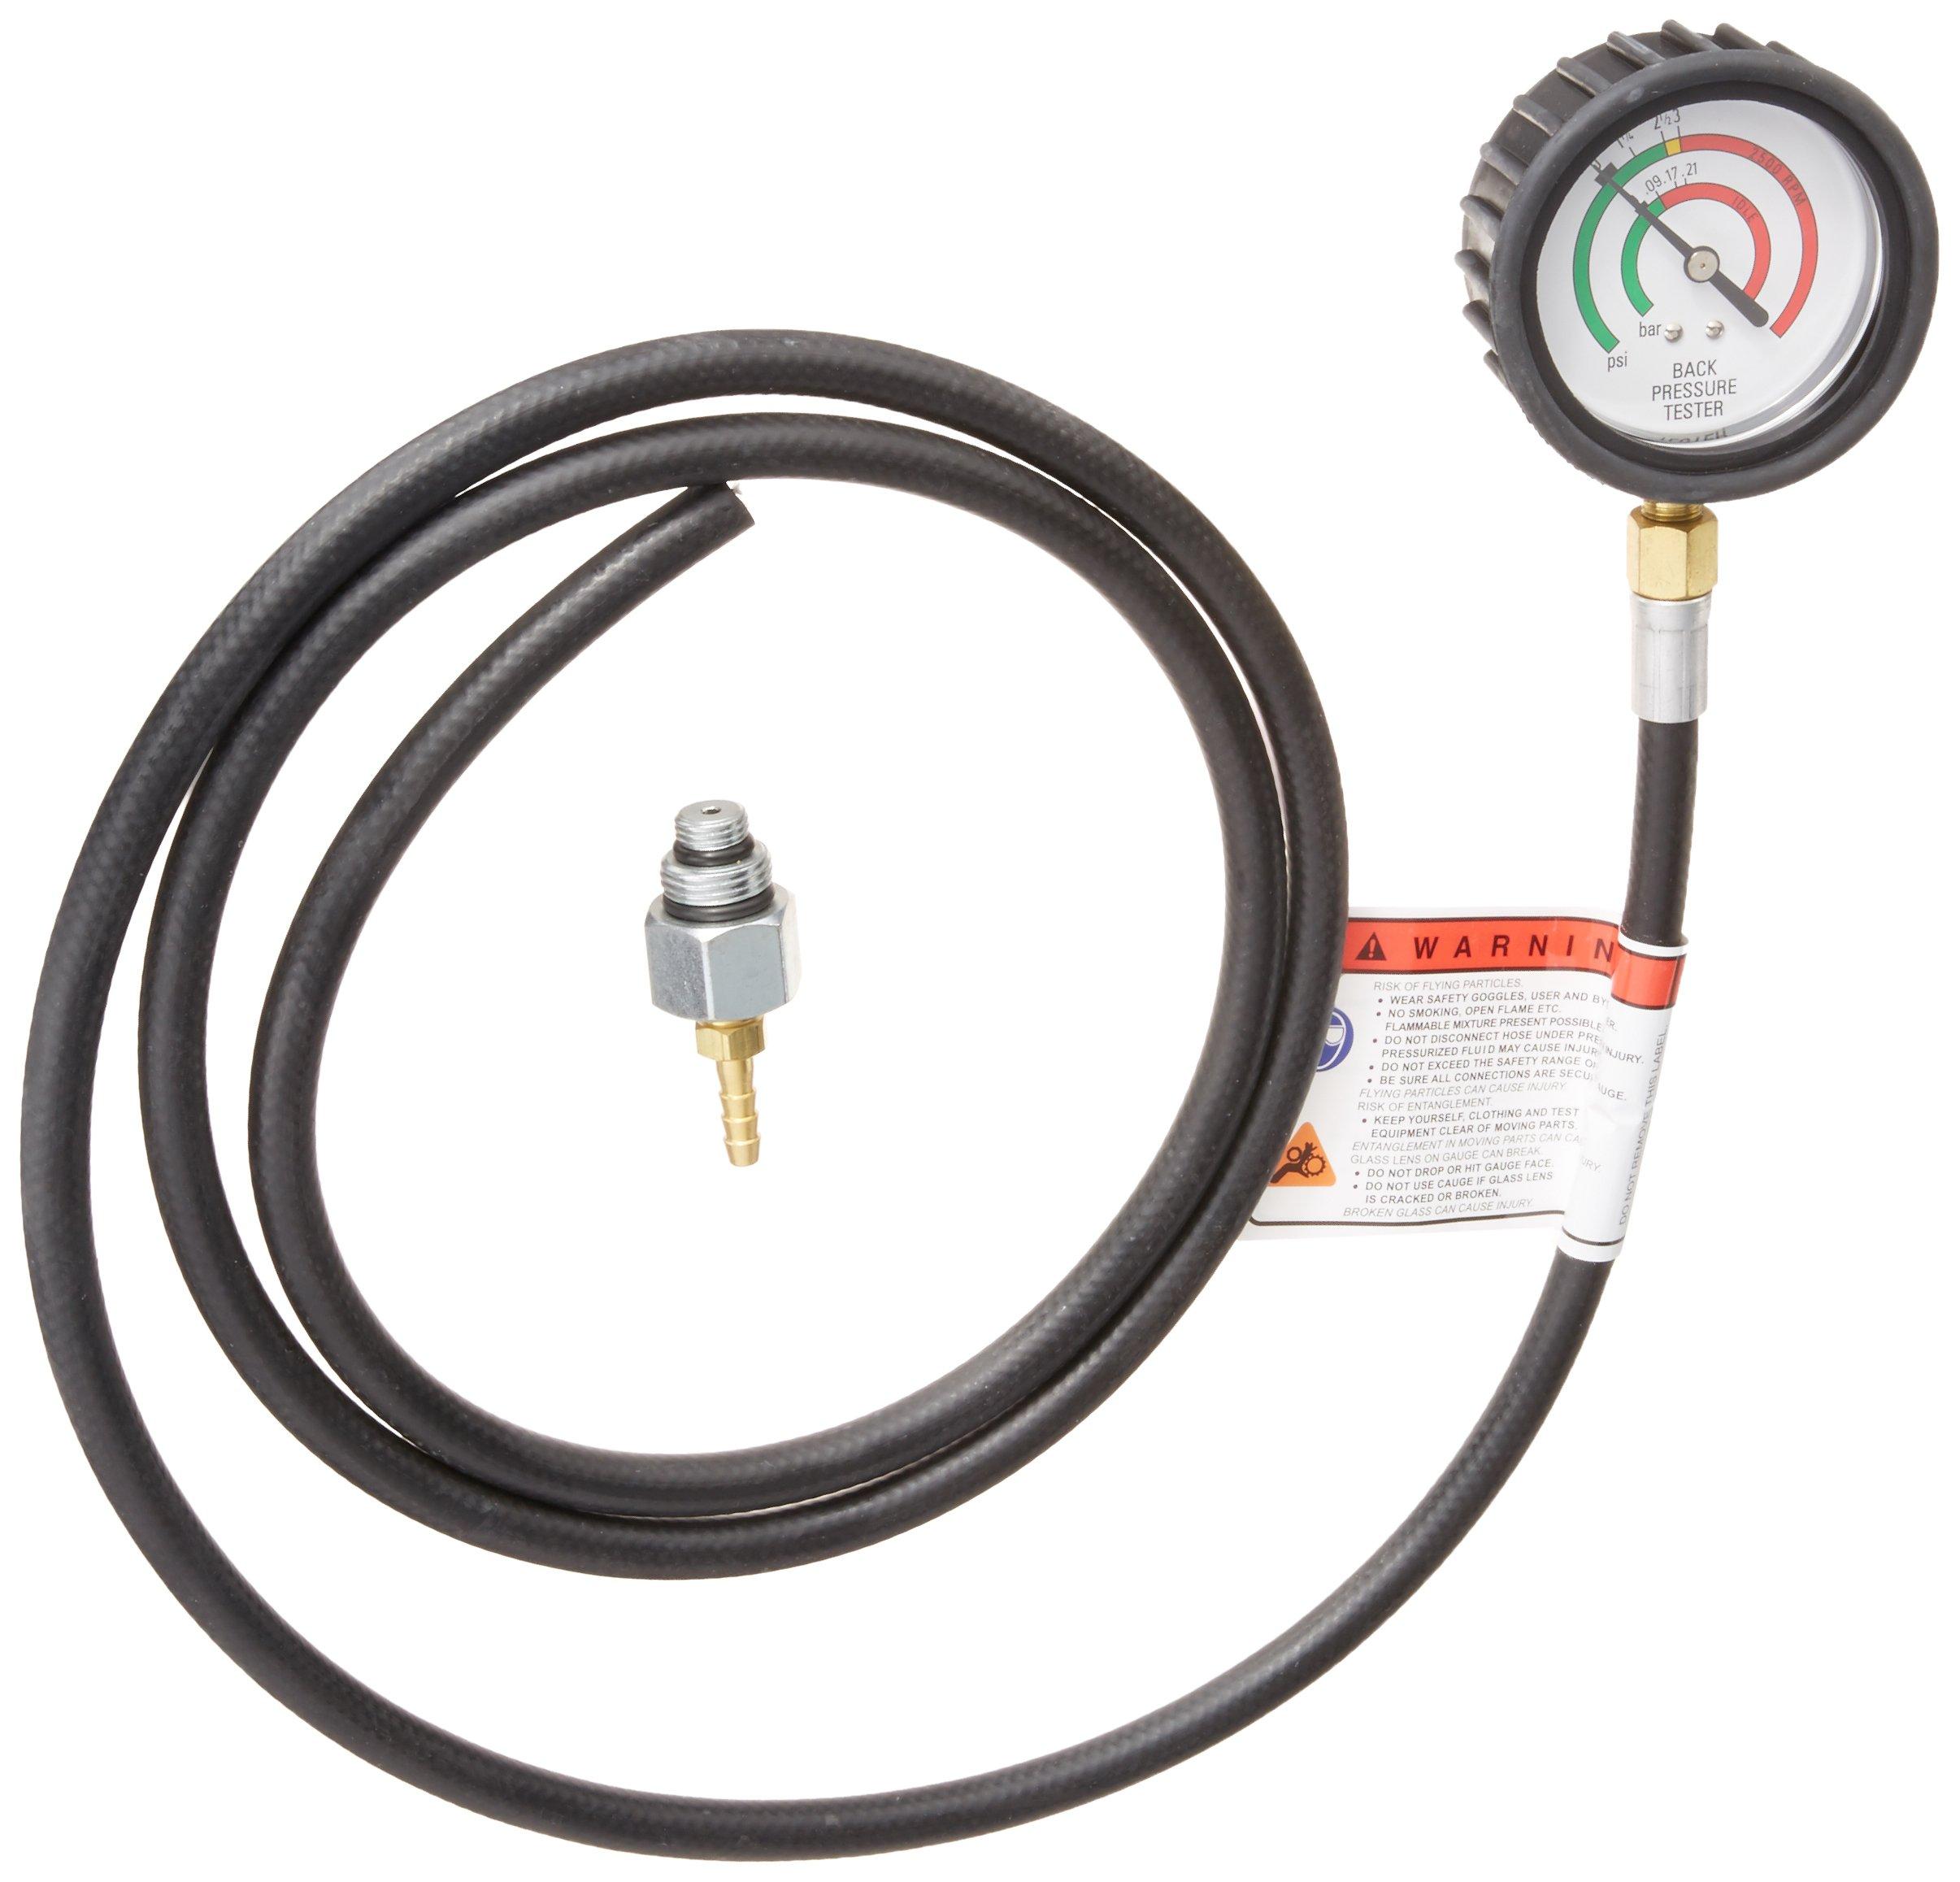 OEMTOOLS 27263 Exhaust Back Pressure Tester/Gauge